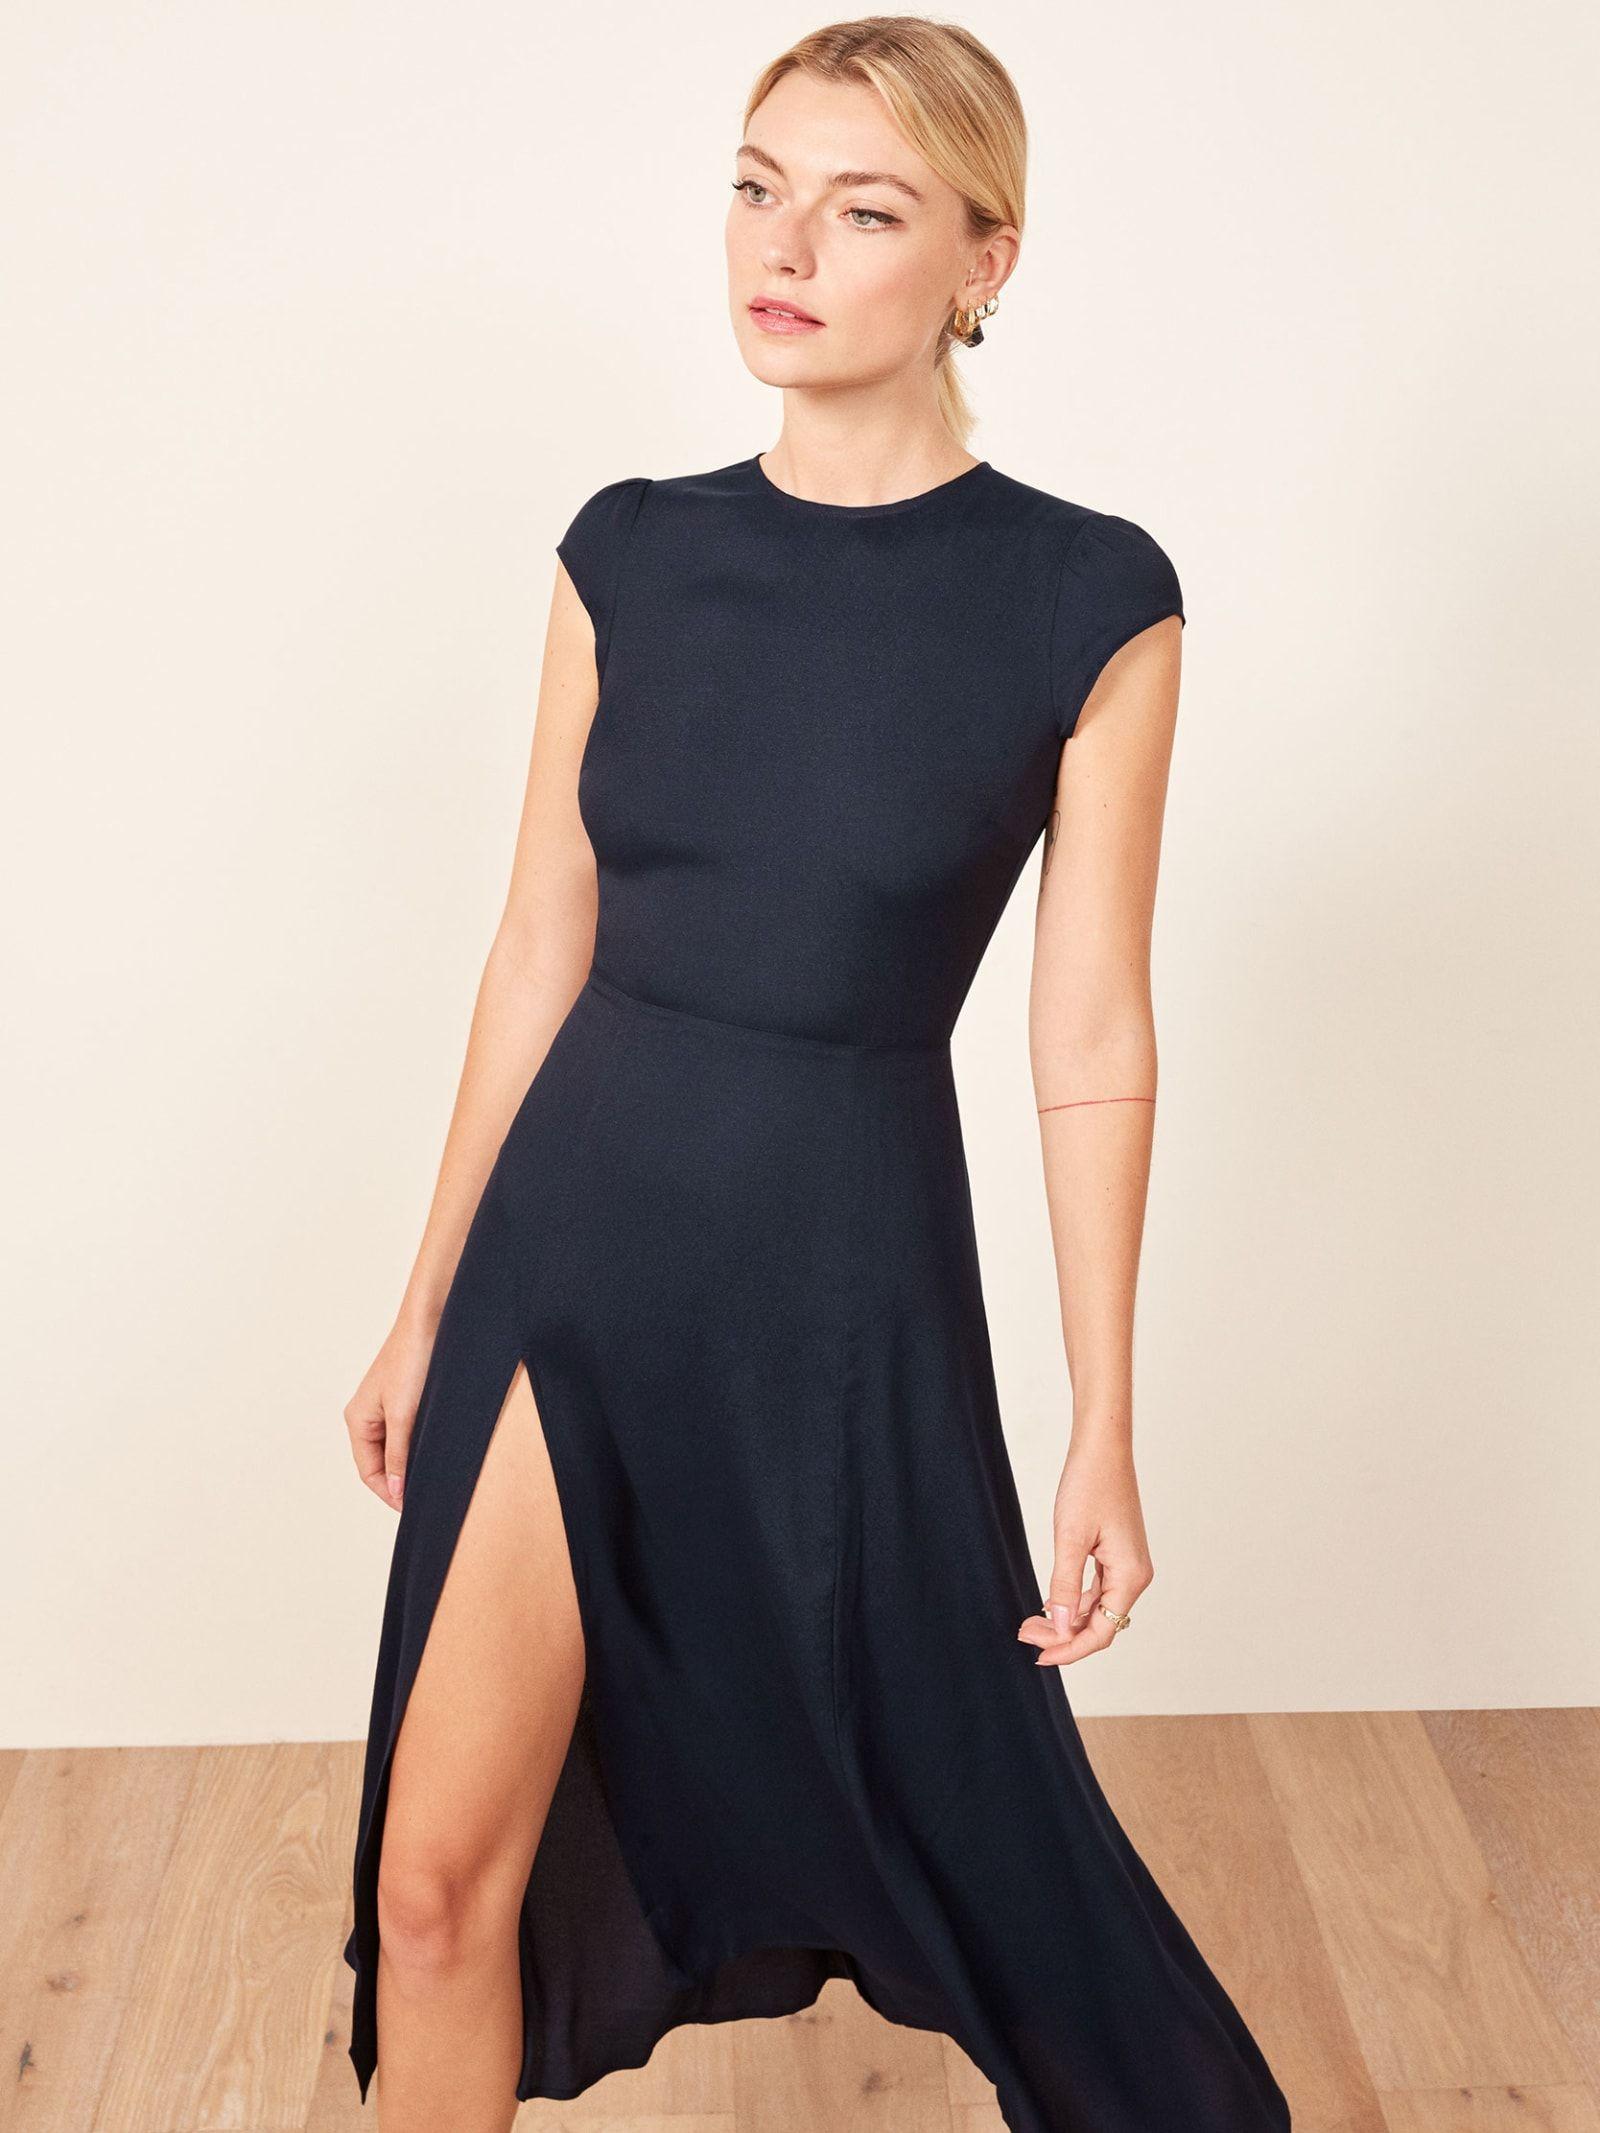 QUIZ Damen Black Side Neck Tie Sleeveless Midi Dress cocktailkleid